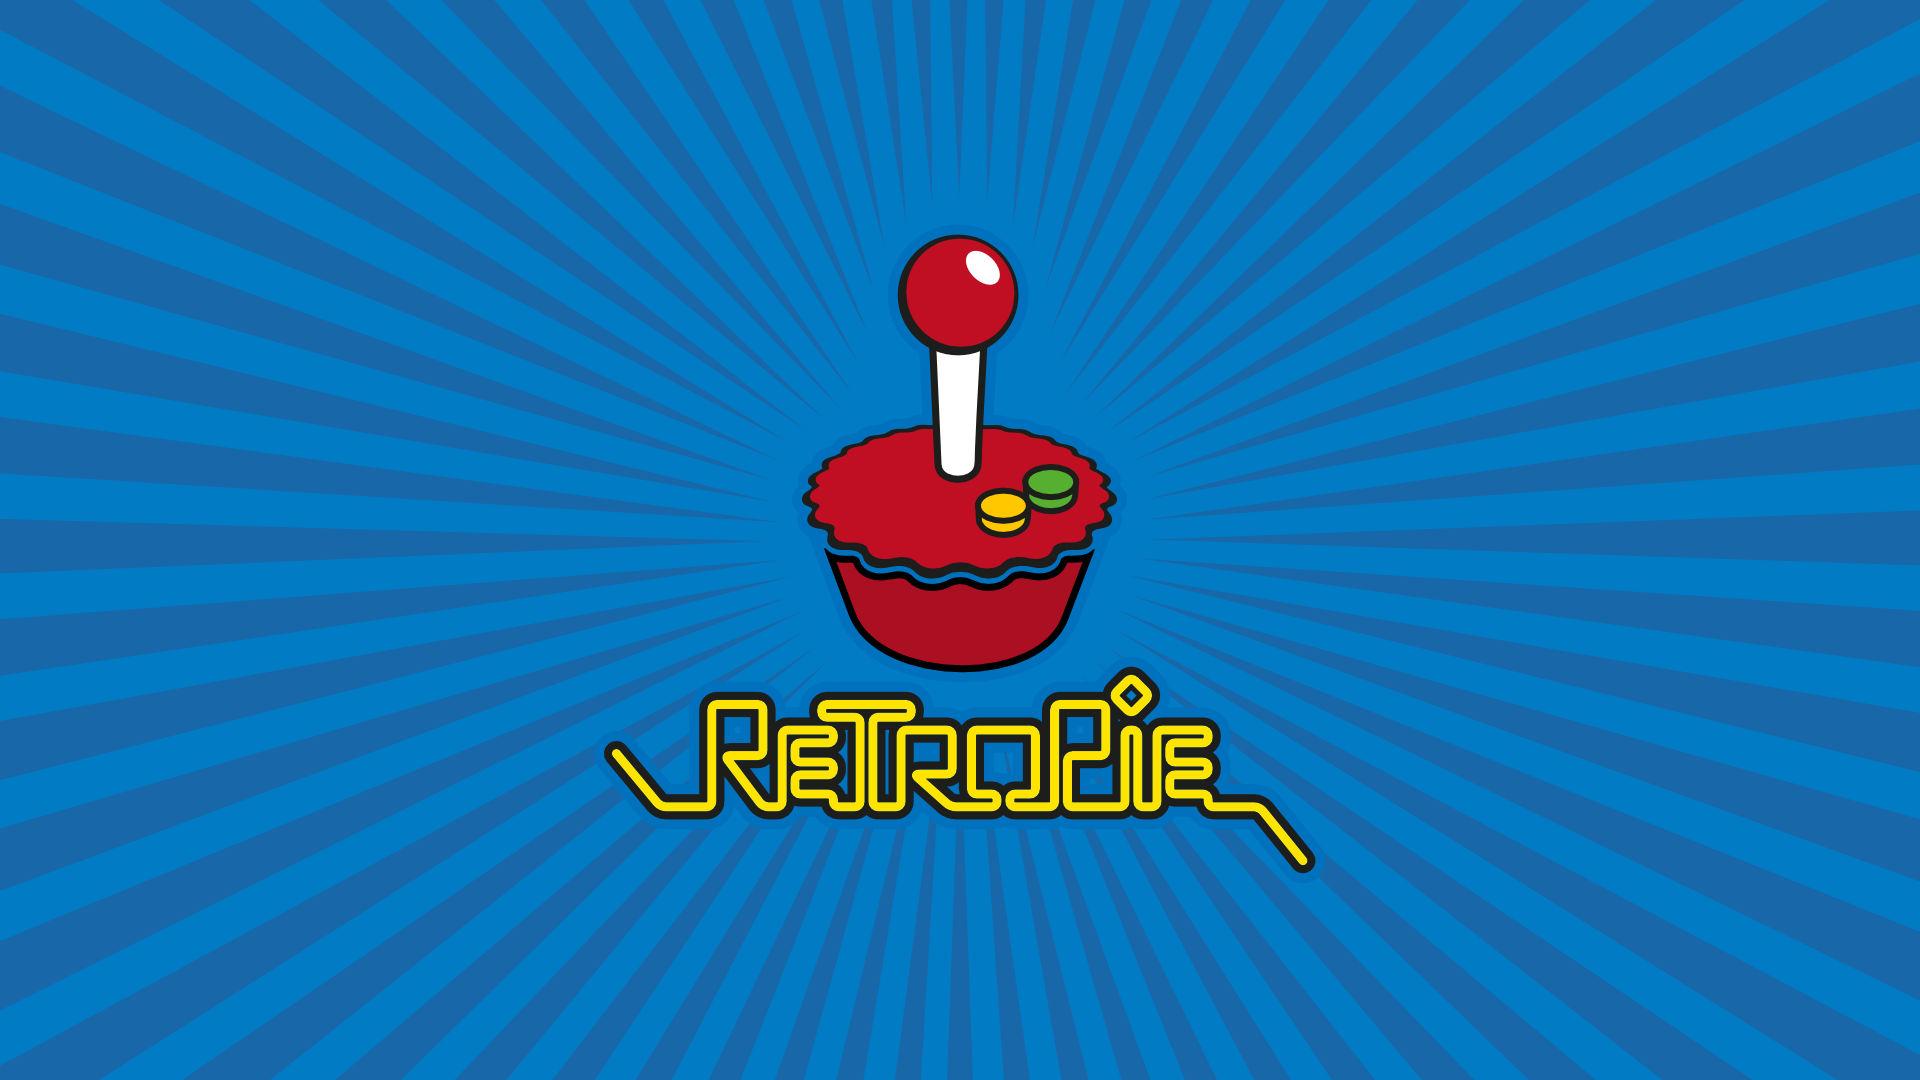 http://blog.petrockblock.com/wp-content/uploads/2015/05/RetroPieSplashscreenBlue.jpg